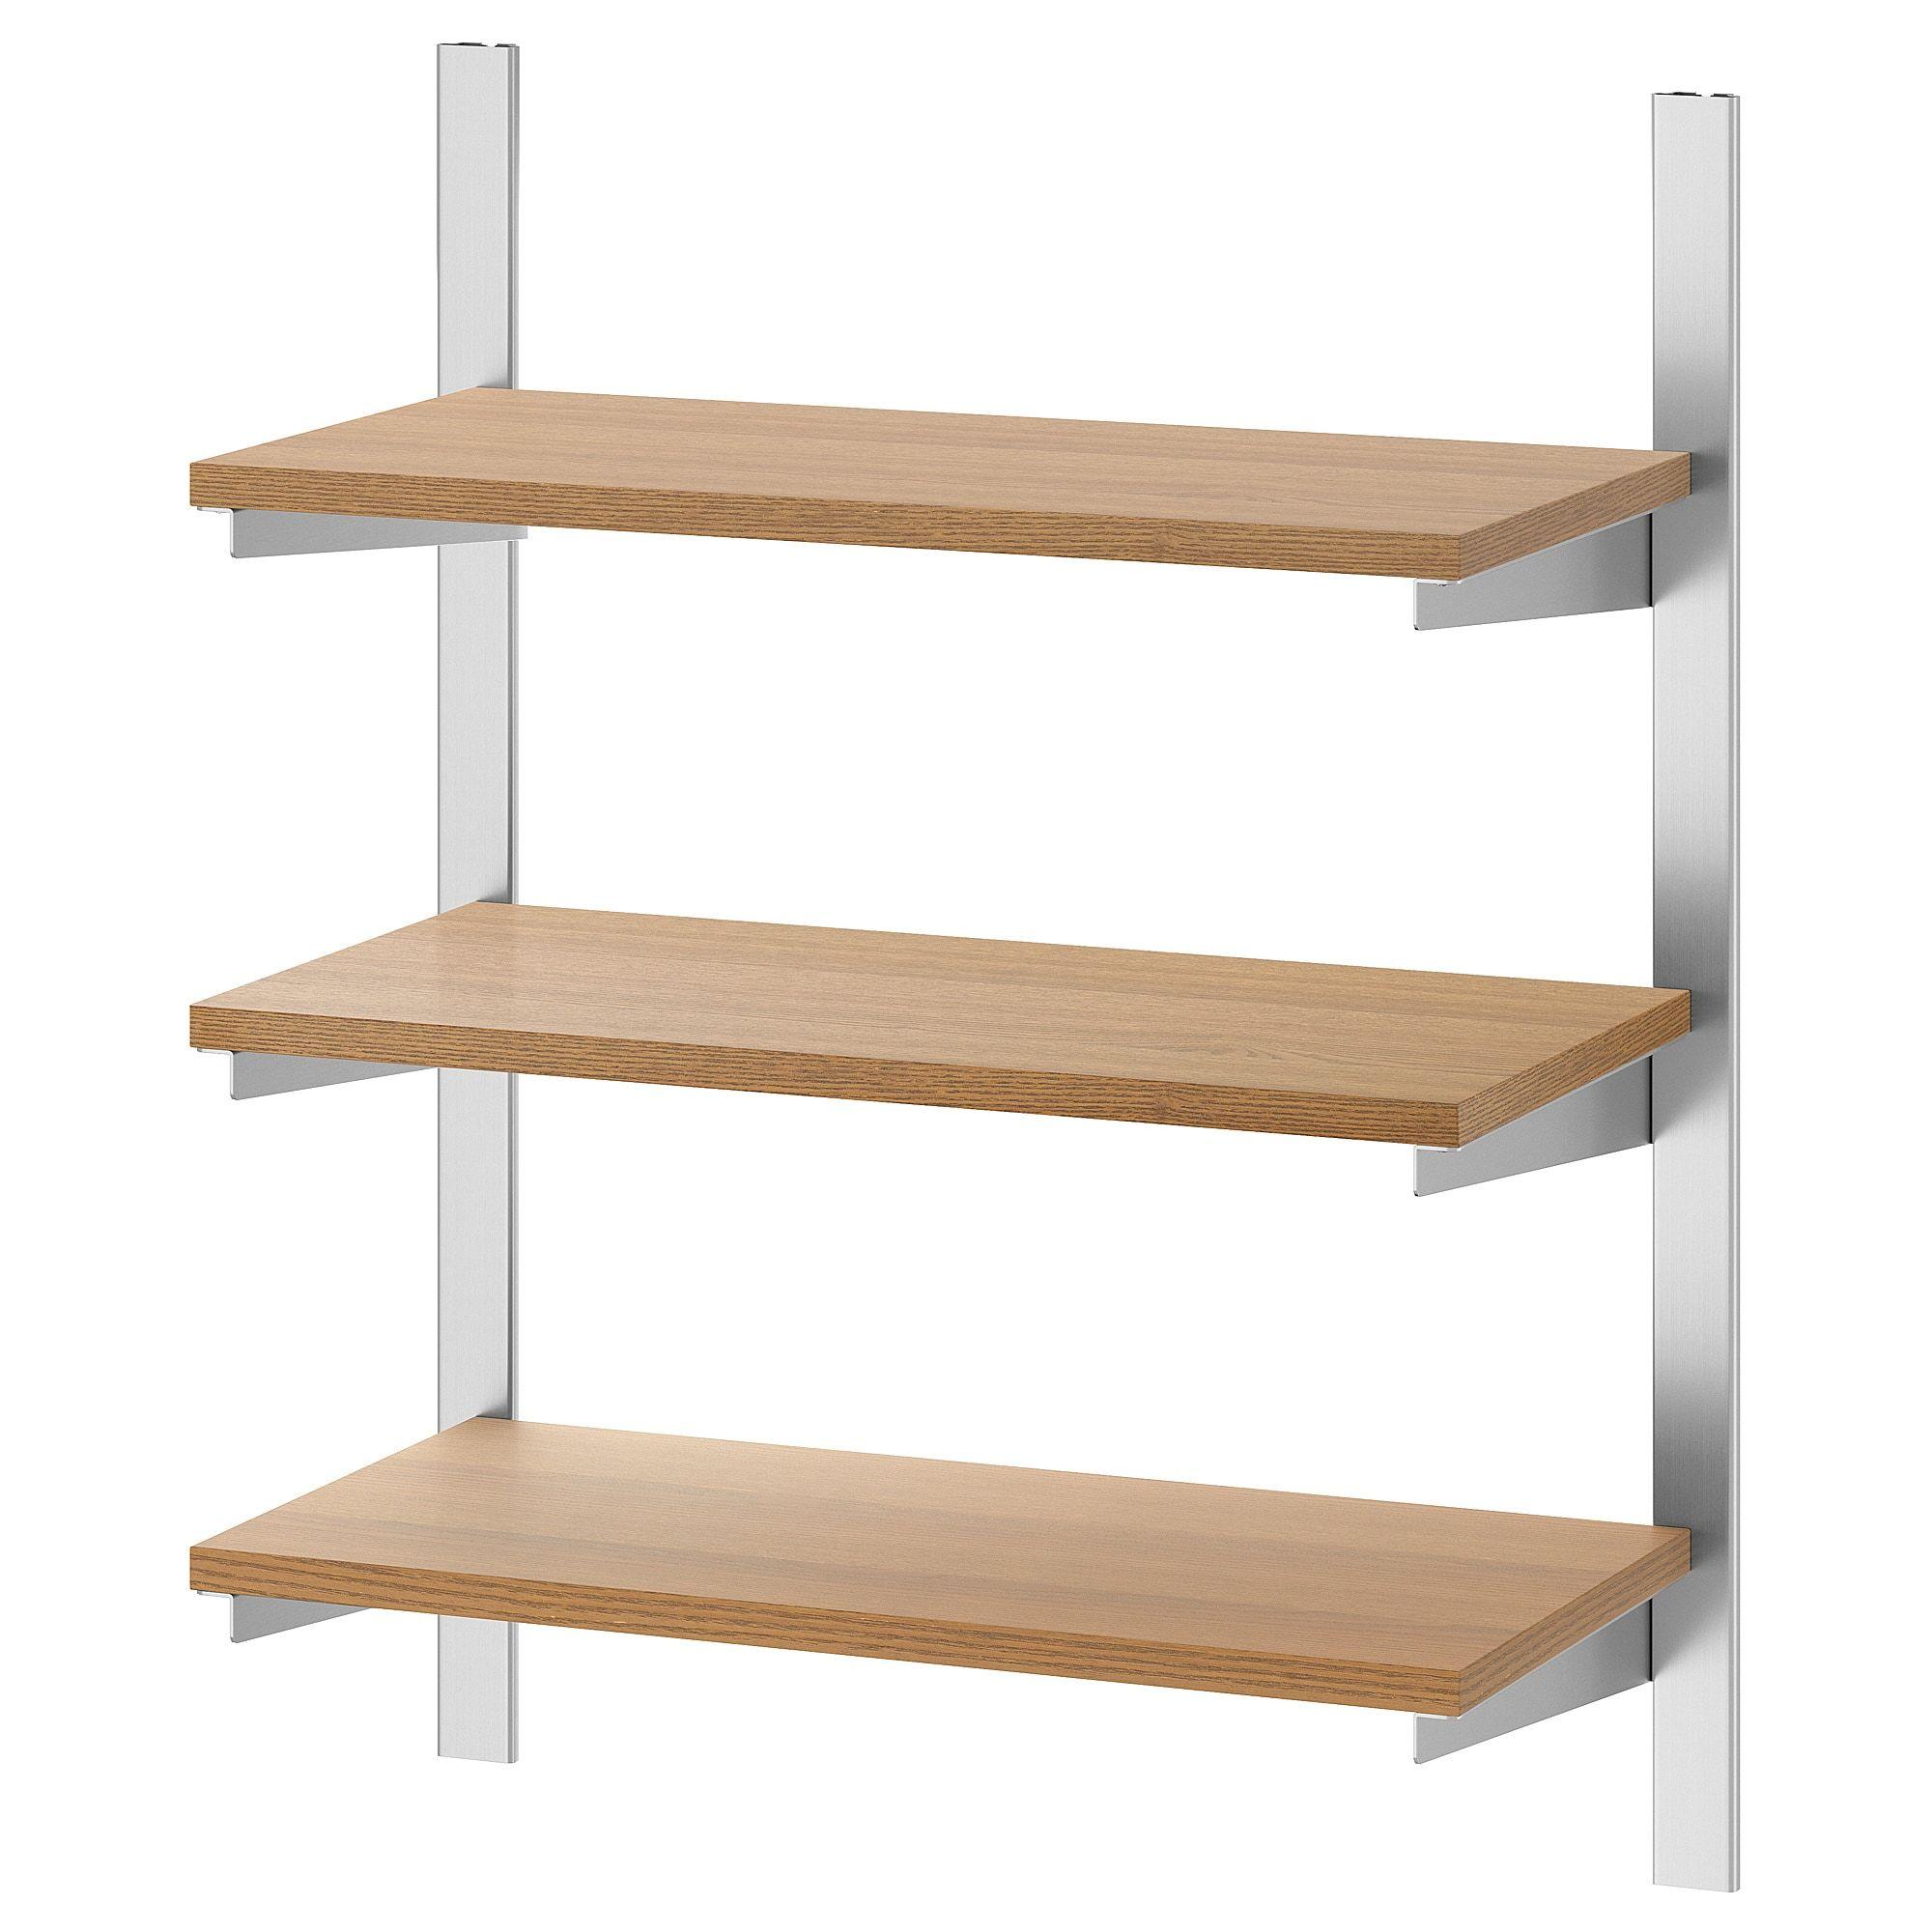 Kungsfors Aufhangeschiene Boden Edelstahl Esche Ikea Deutschland In 2020 Korbe An Wand Edelstahl Bambus